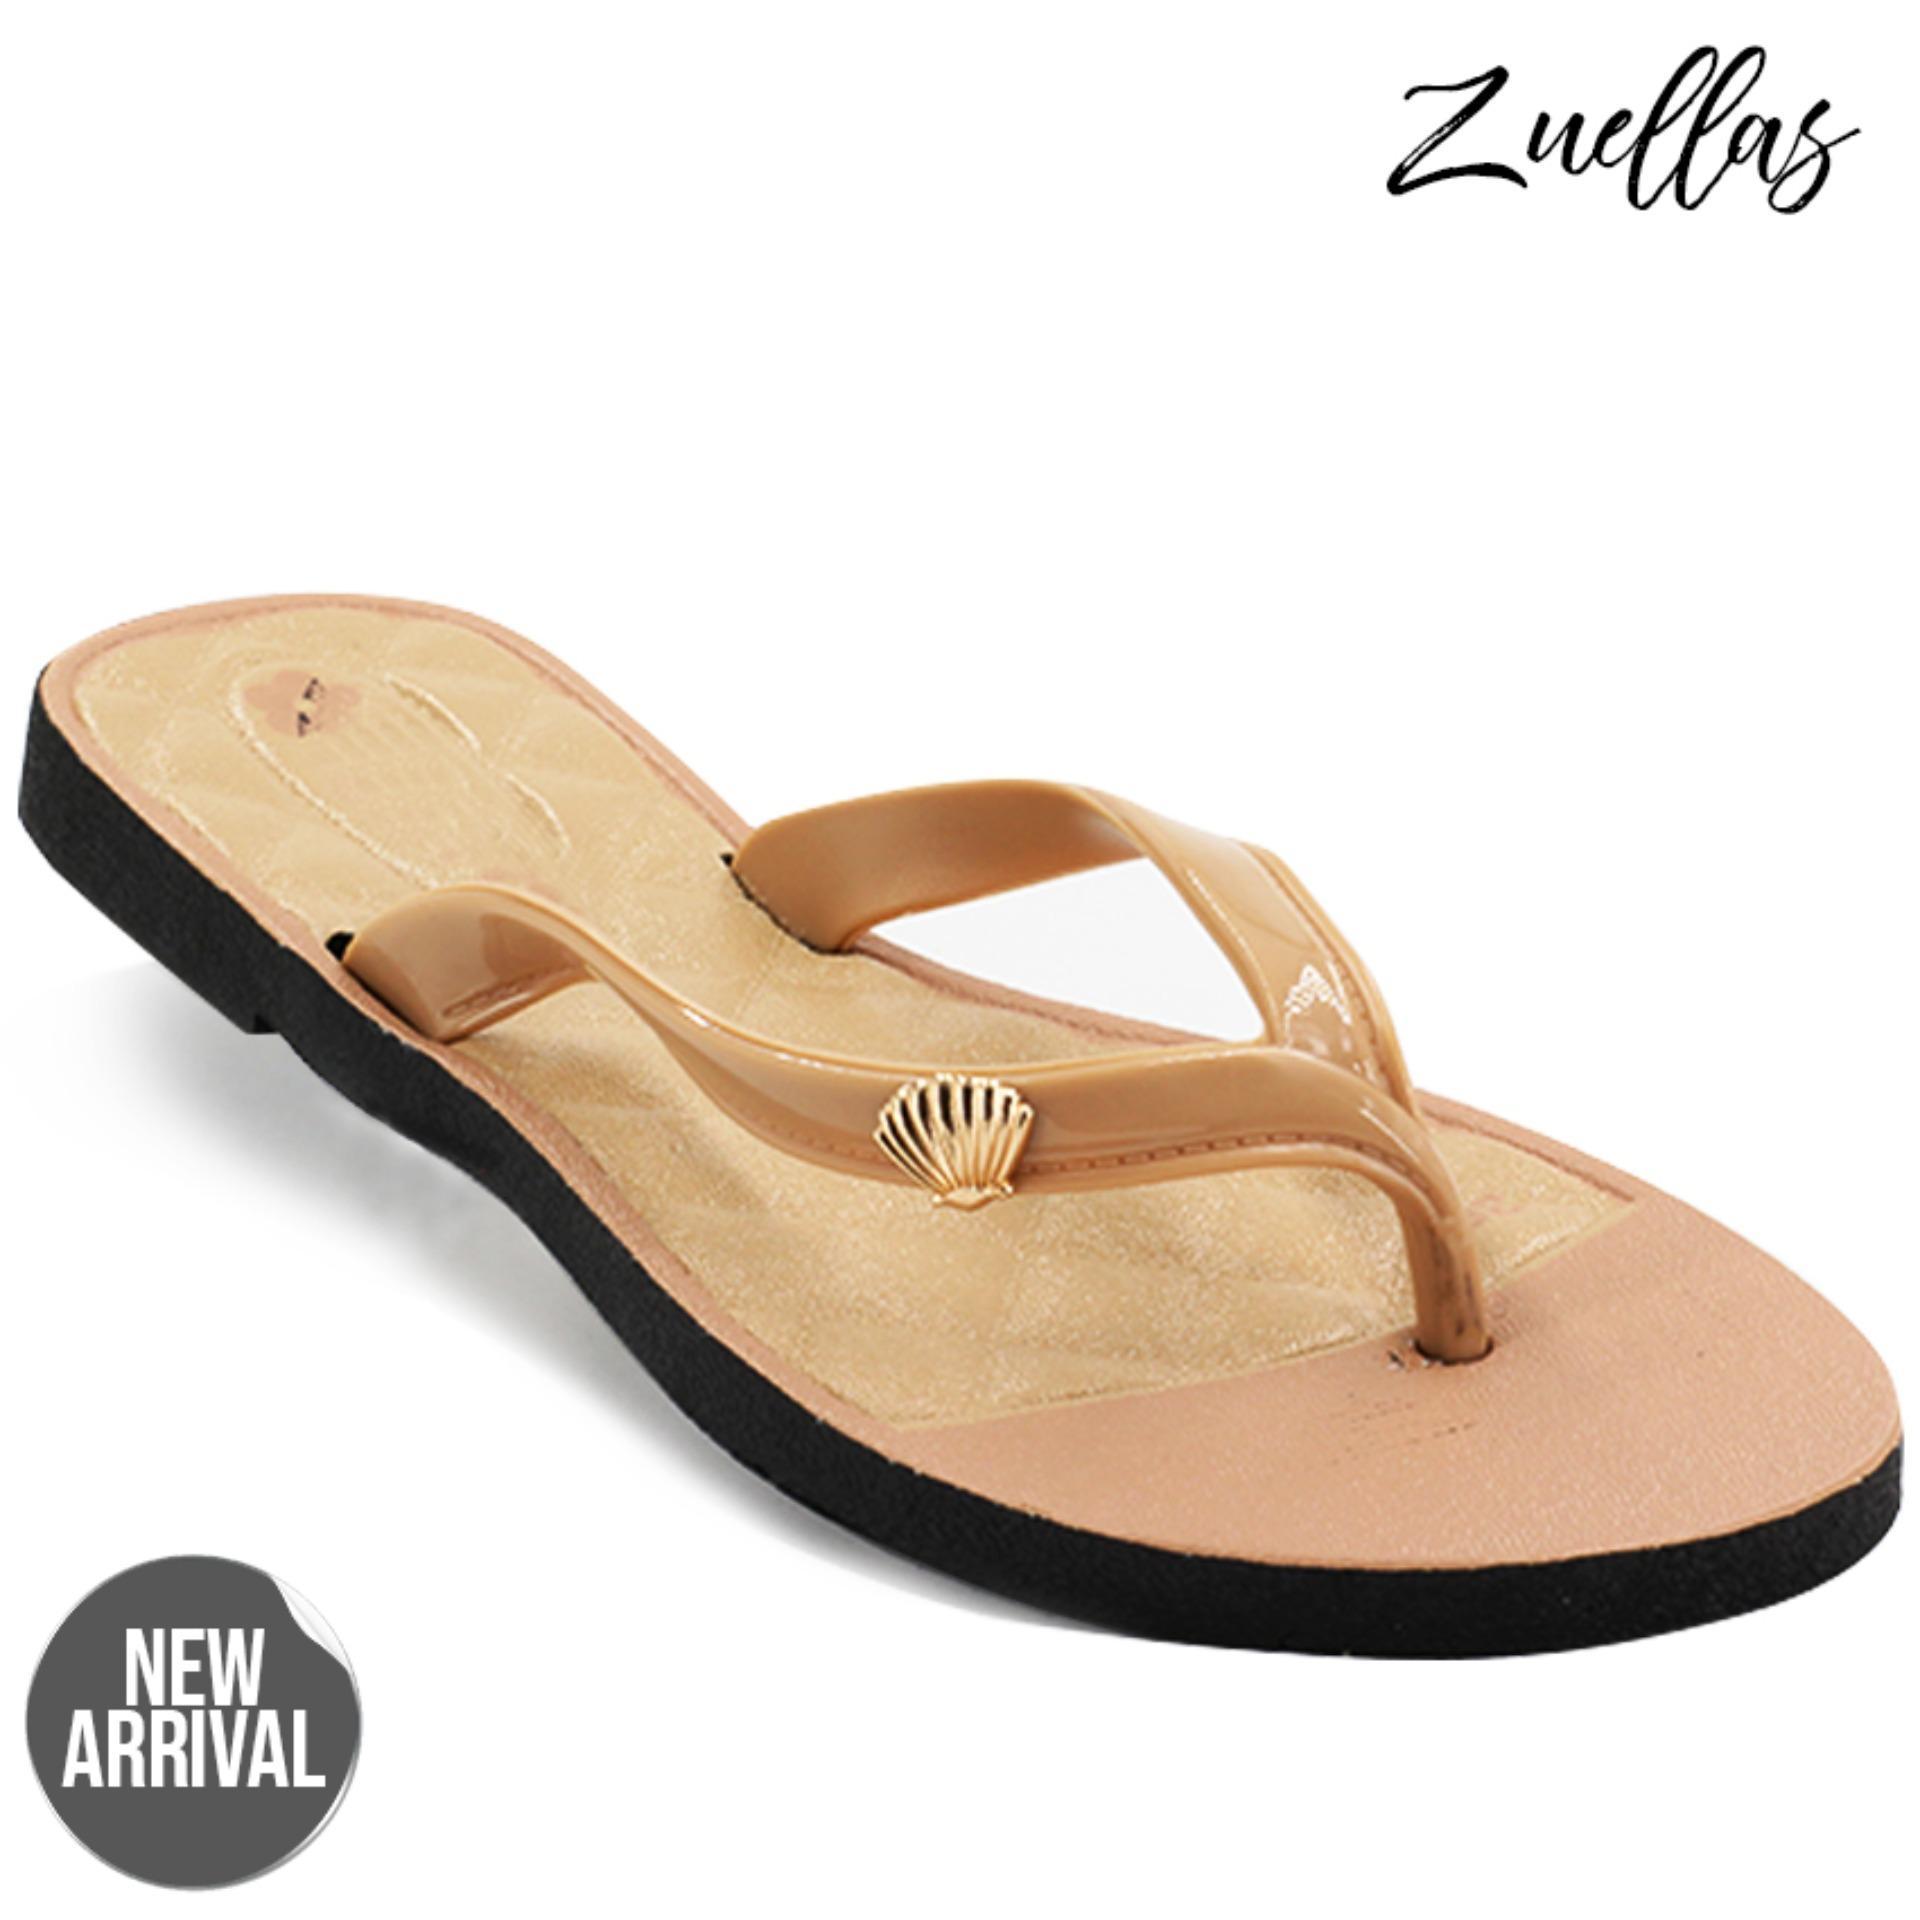 0fb2adf9e080d5 Beach Sandals Indoor Outdoor Casual Shoes - intl Terbaru. Source · Zuellas  Women s .